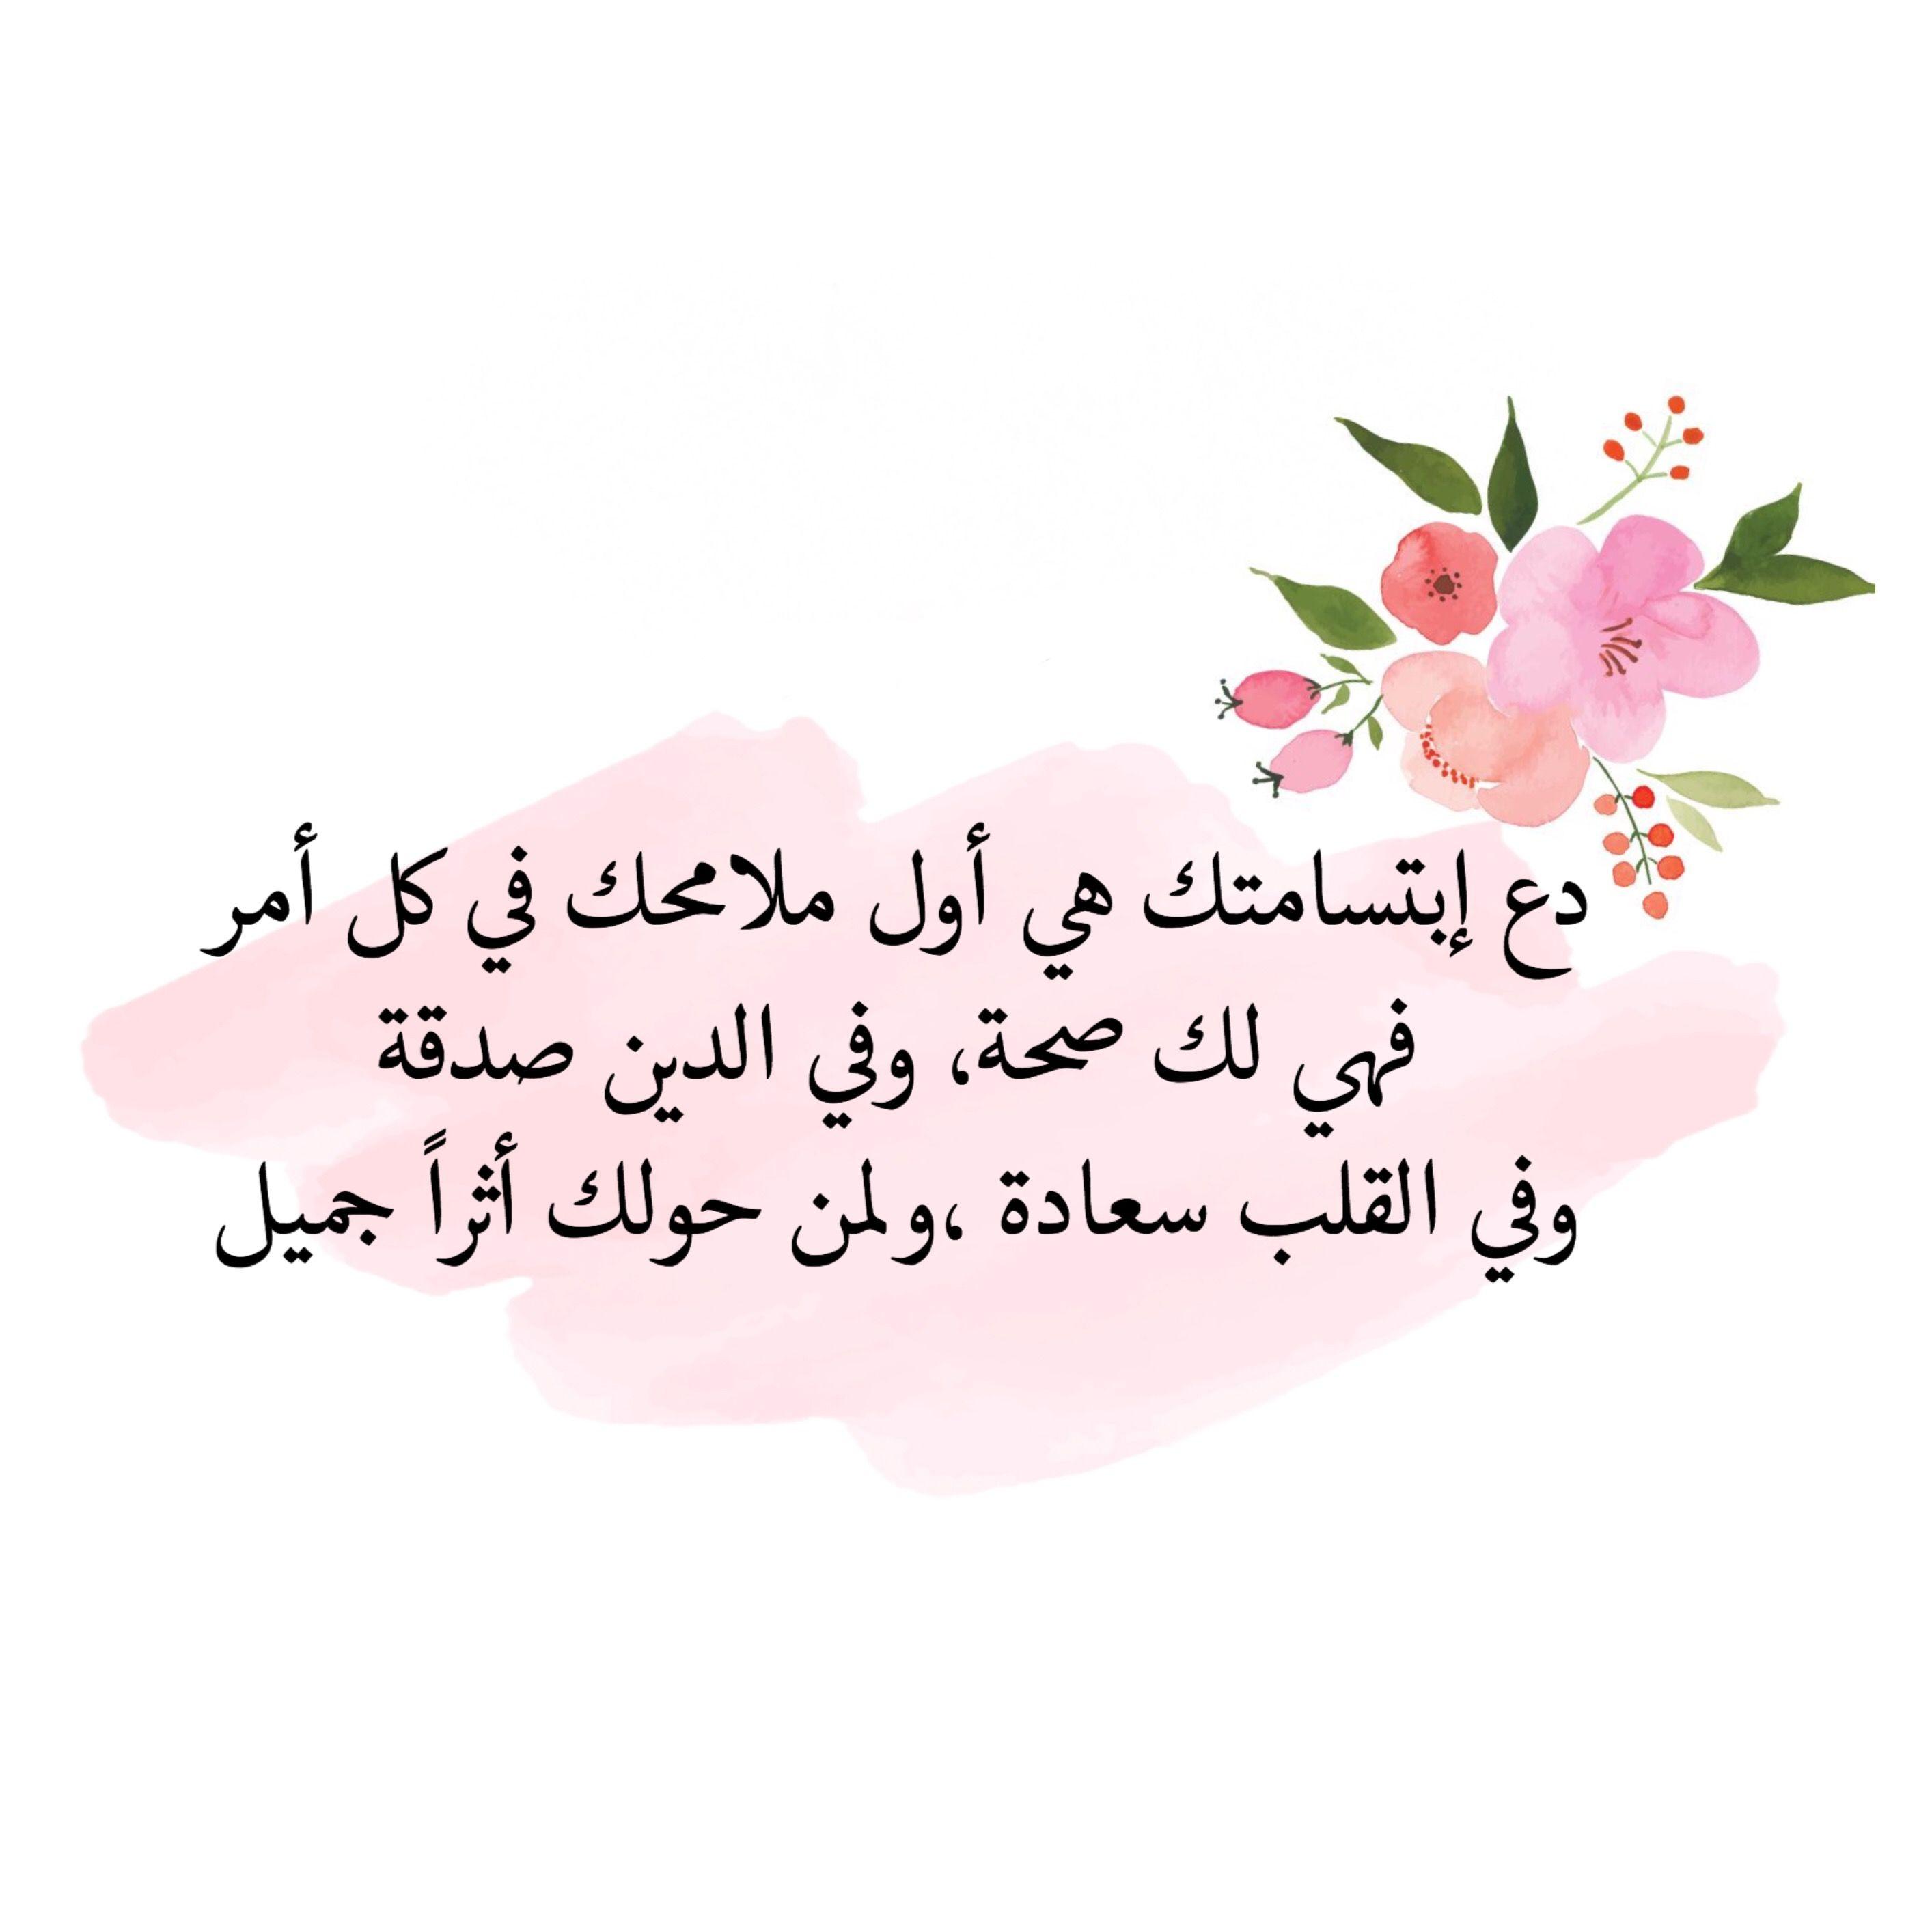 الابتسامة صدقة Quotes For Book Lovers Islamic Quotes Wallpaper Quotes Rindu